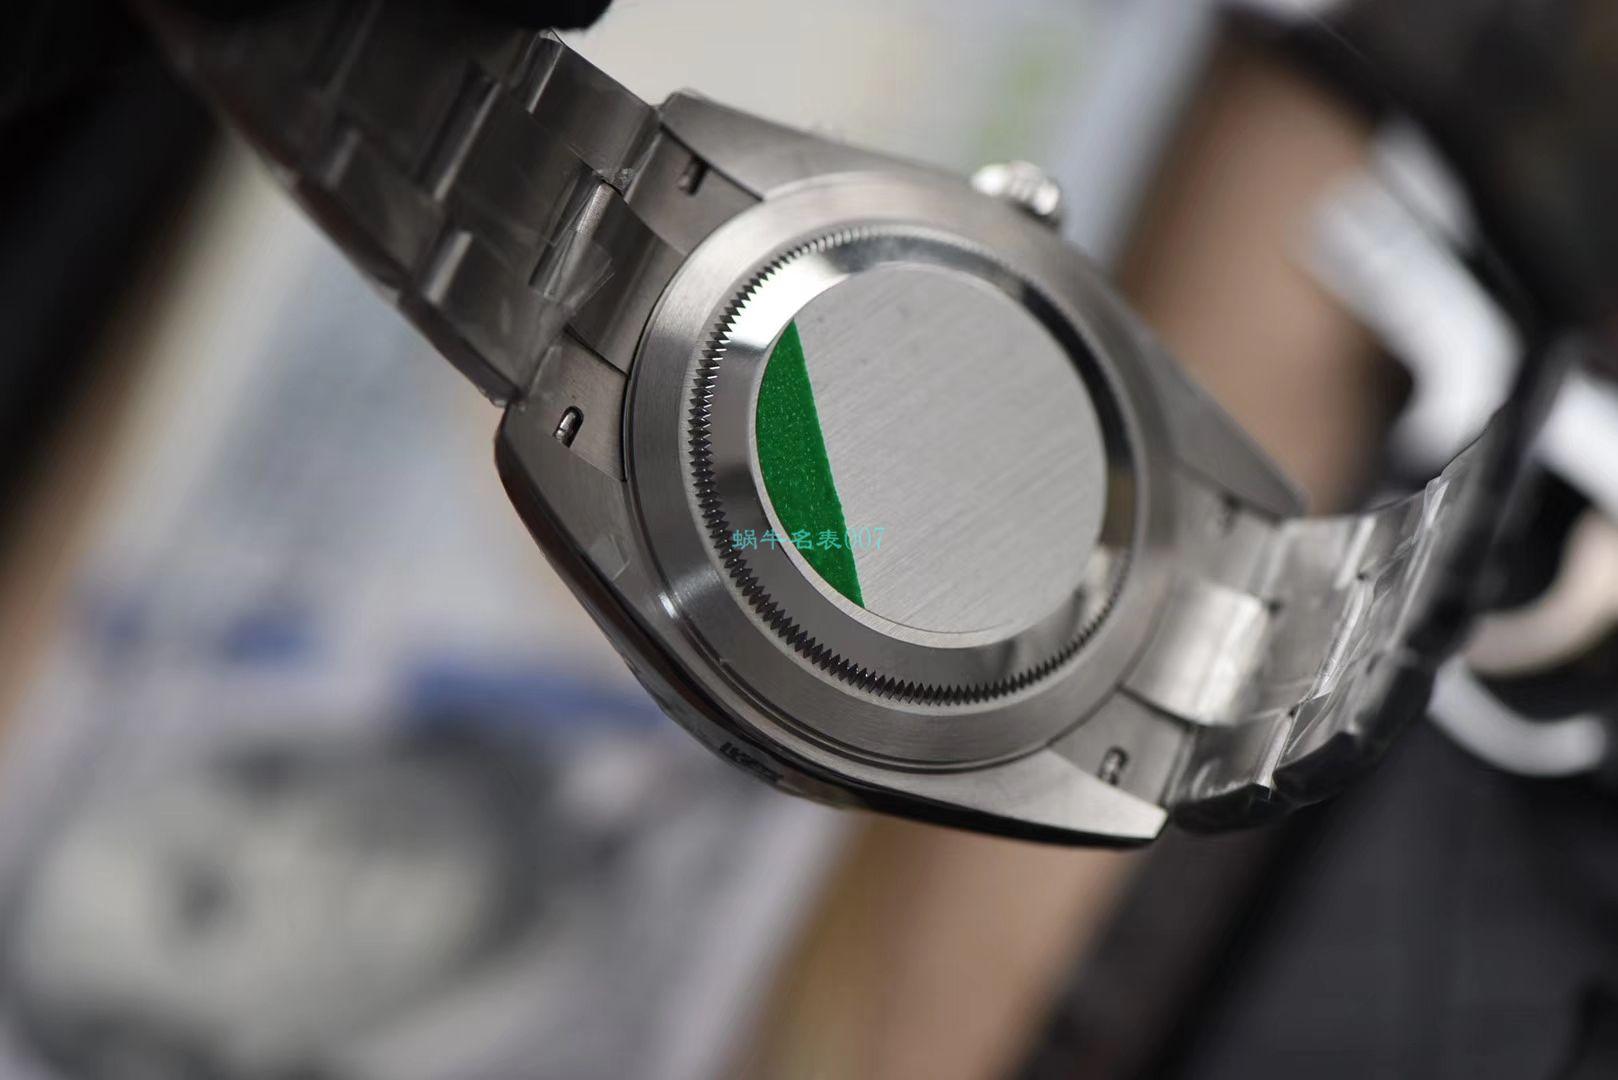 EW厂顶级复刻劳力士日志型系列m126334-0017,m126331-0016等腕表 / R561